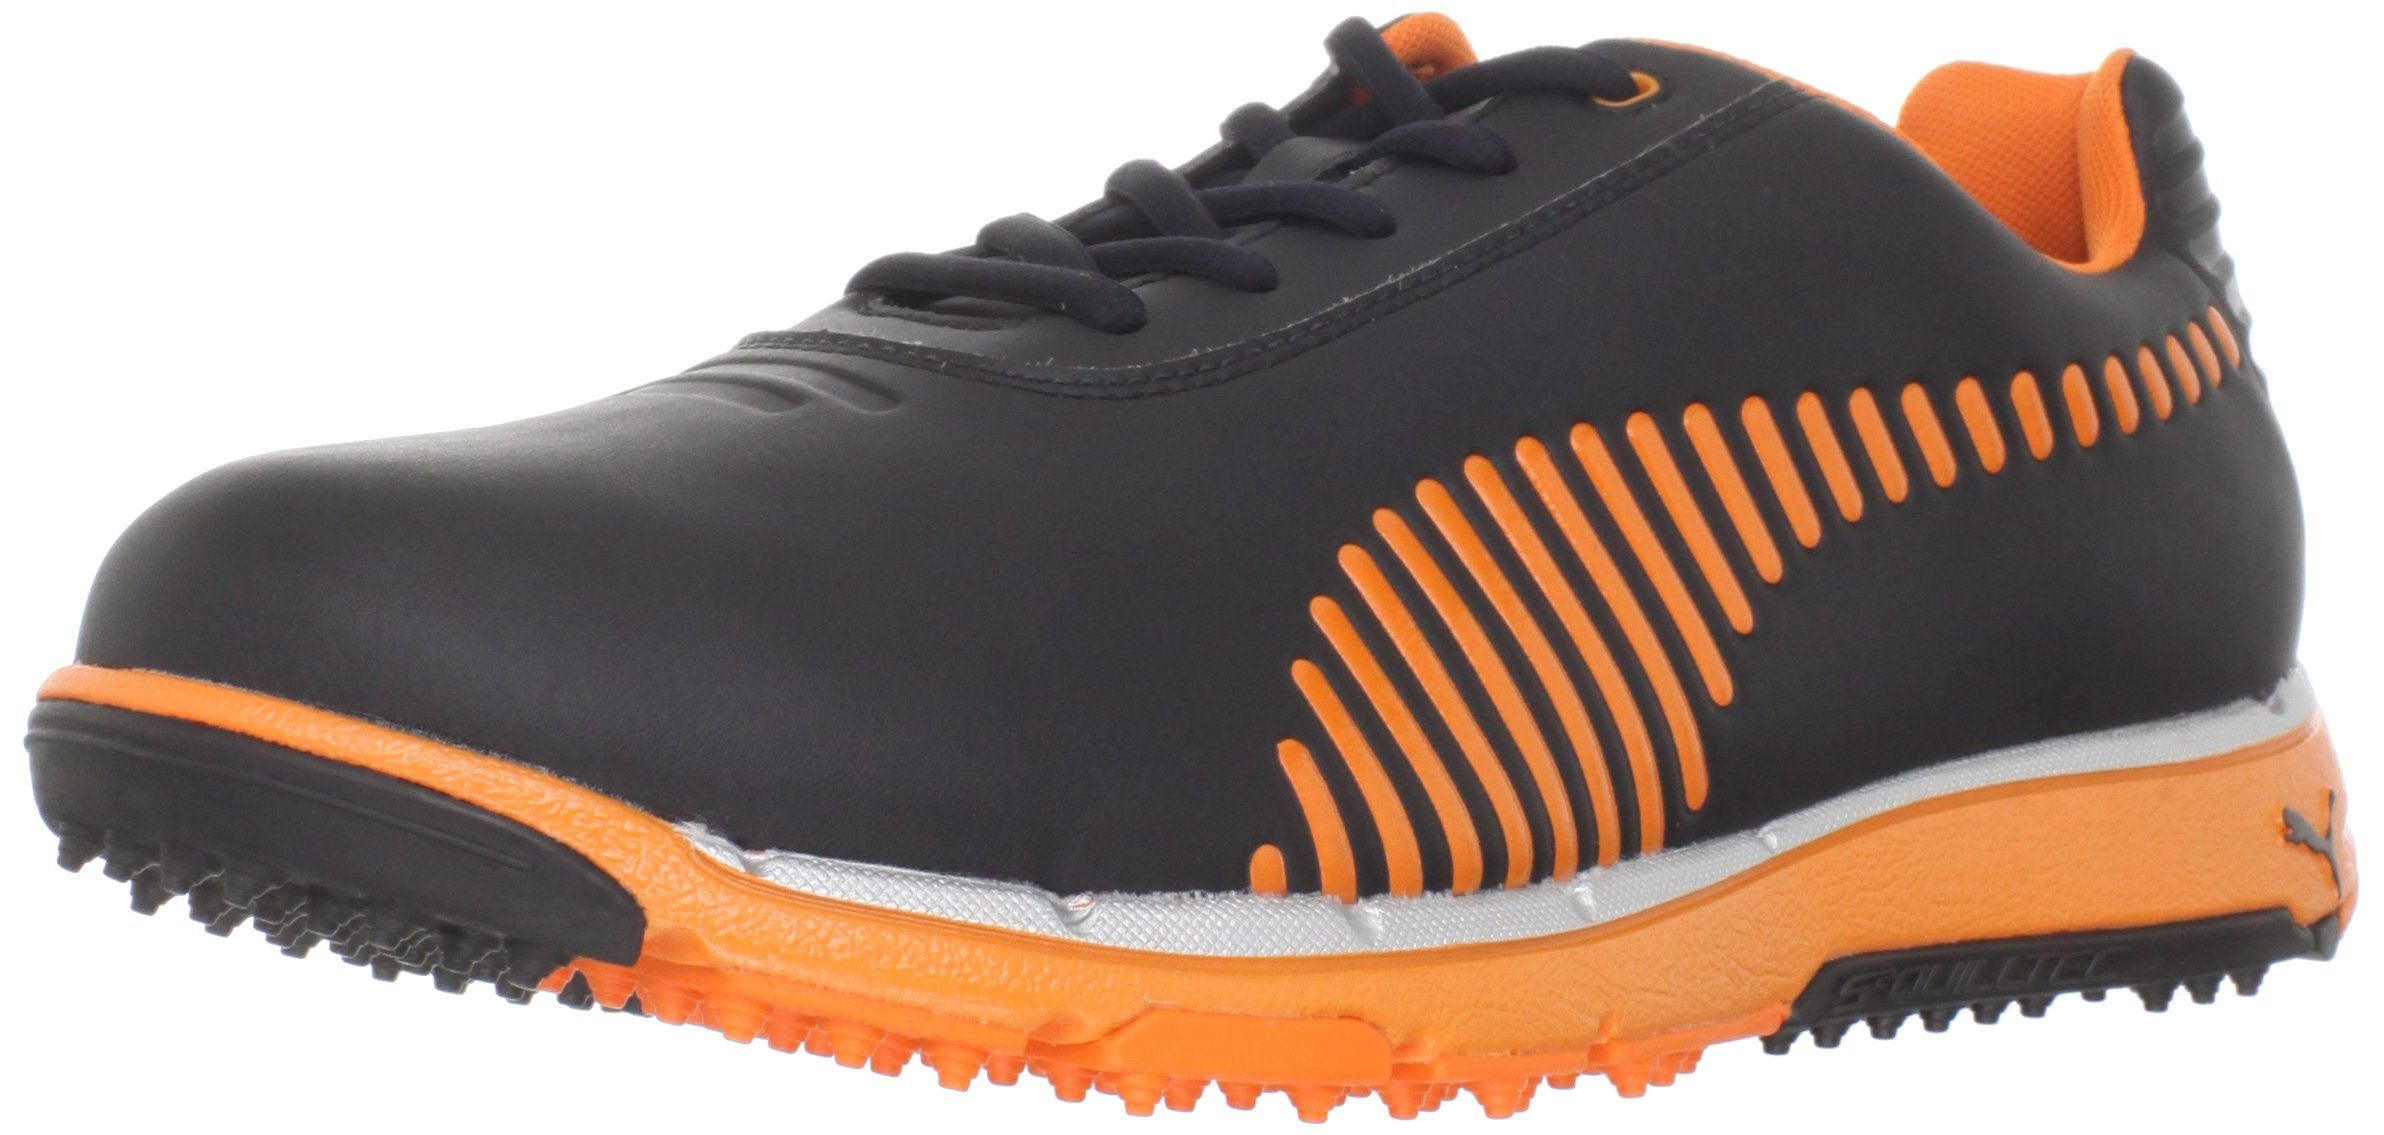 9b2efcfaa2e6d9 PUMA Men s Faas Grip Golf Shoe